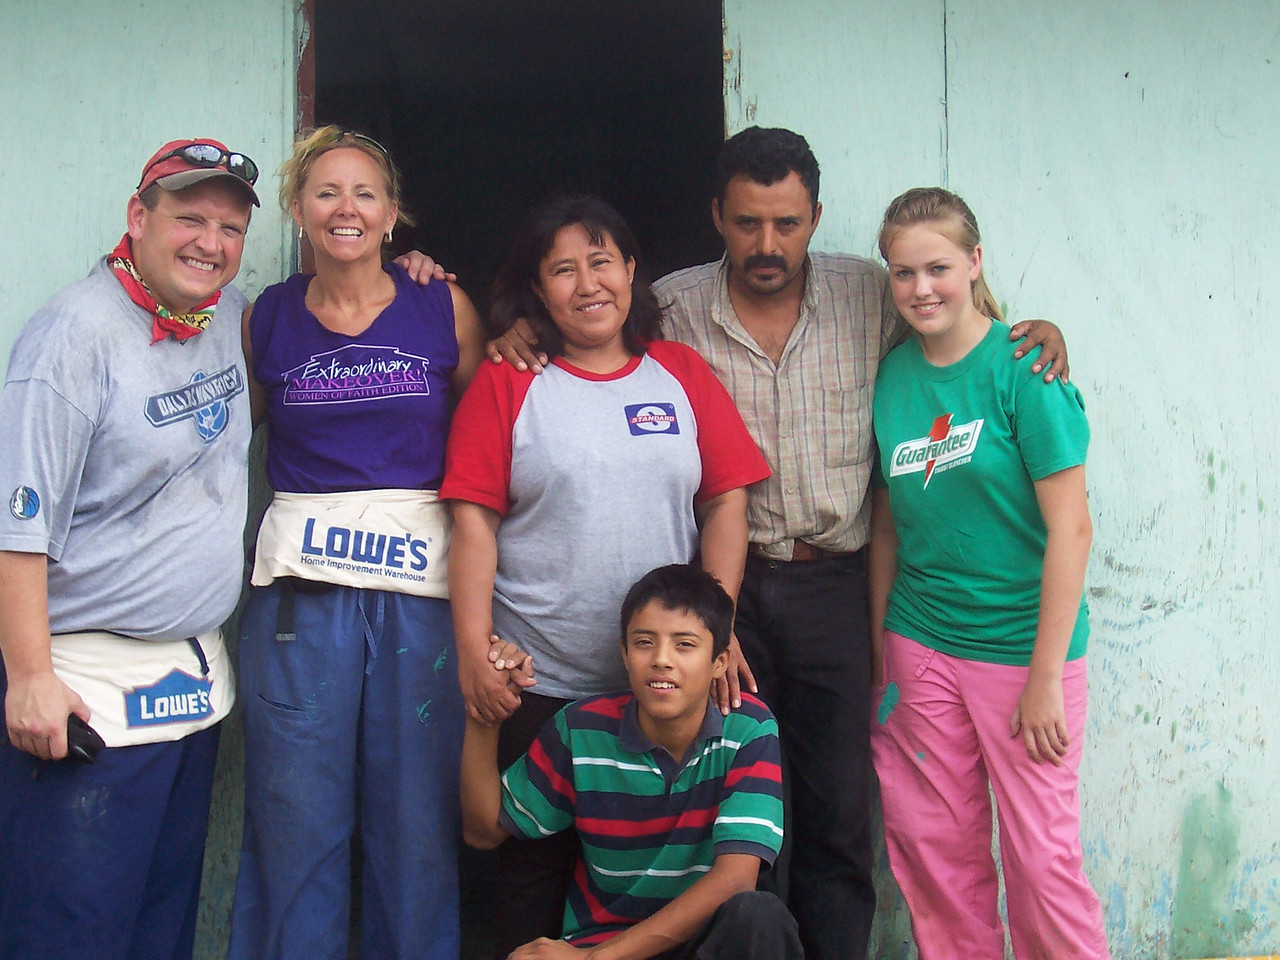 2007-06-21-Mexico-FBCN 006